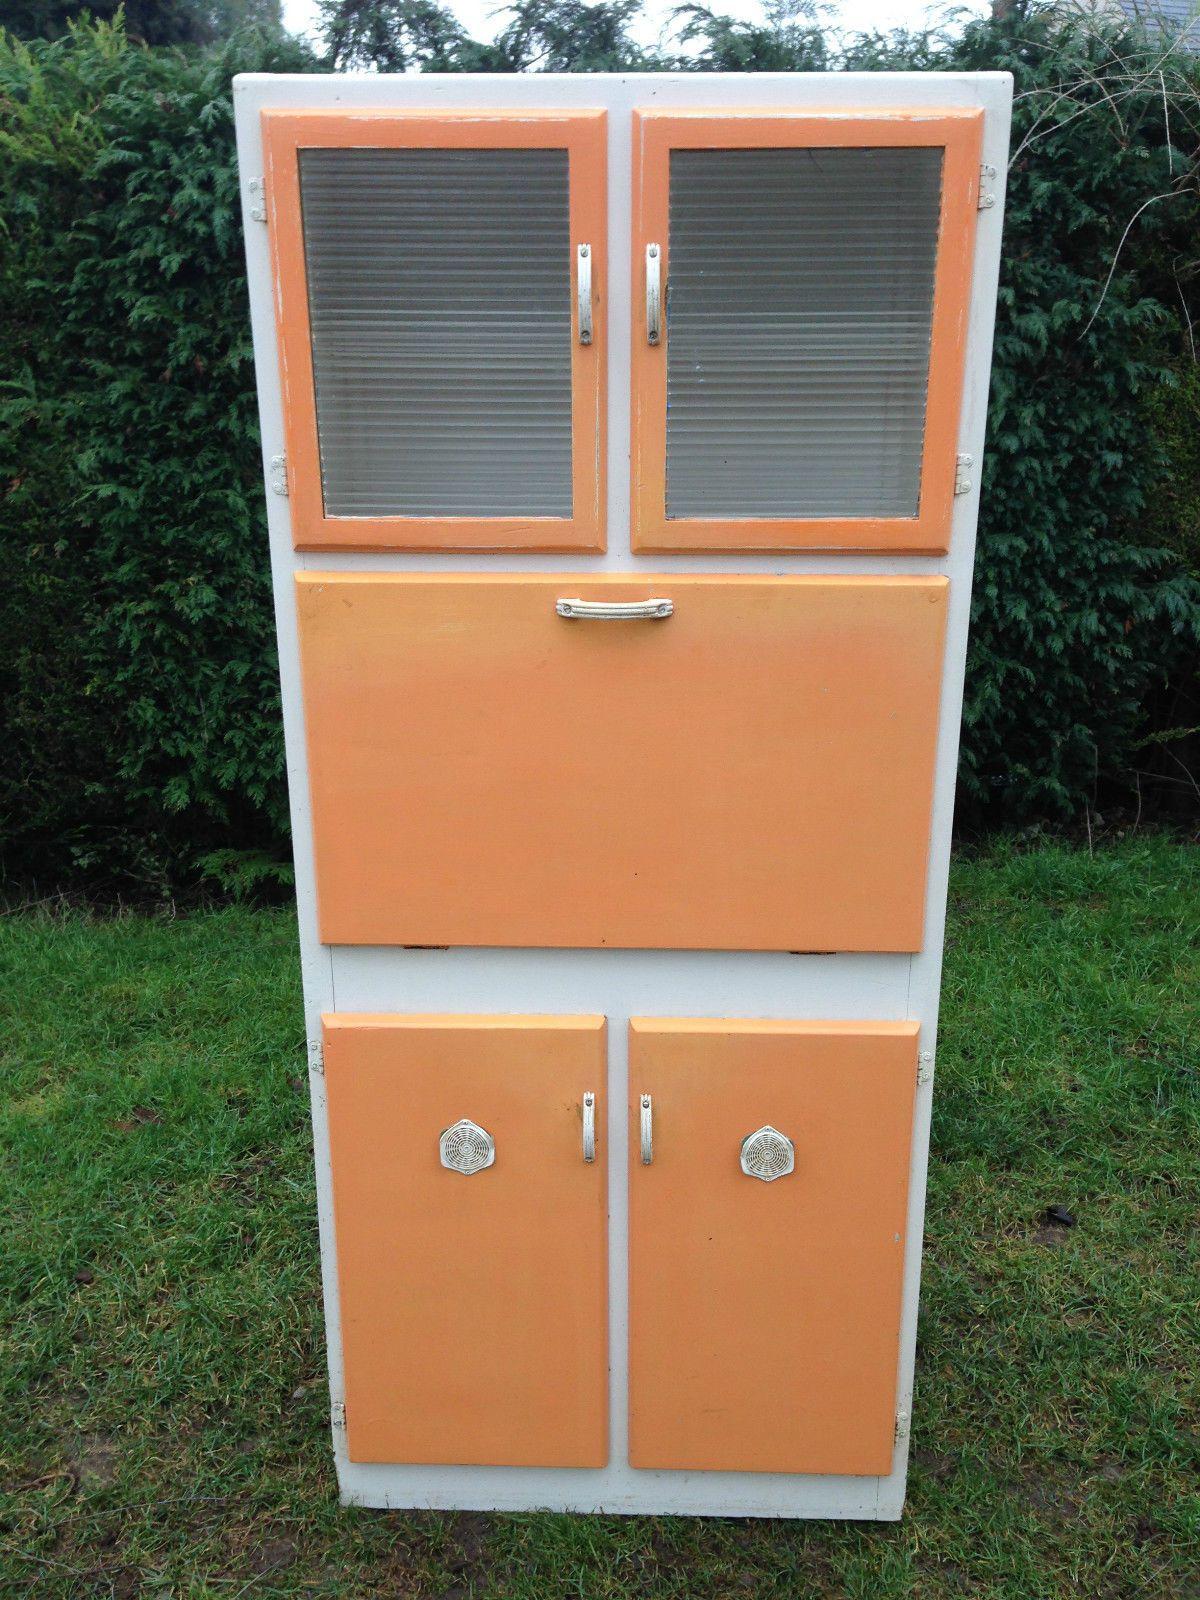 Sale Vintage Wolverine Metal Kitchen Play Toy Red Etsy Kitchen Cabinets For Sale Red Kitchen Cabinets Cabinets For Sale